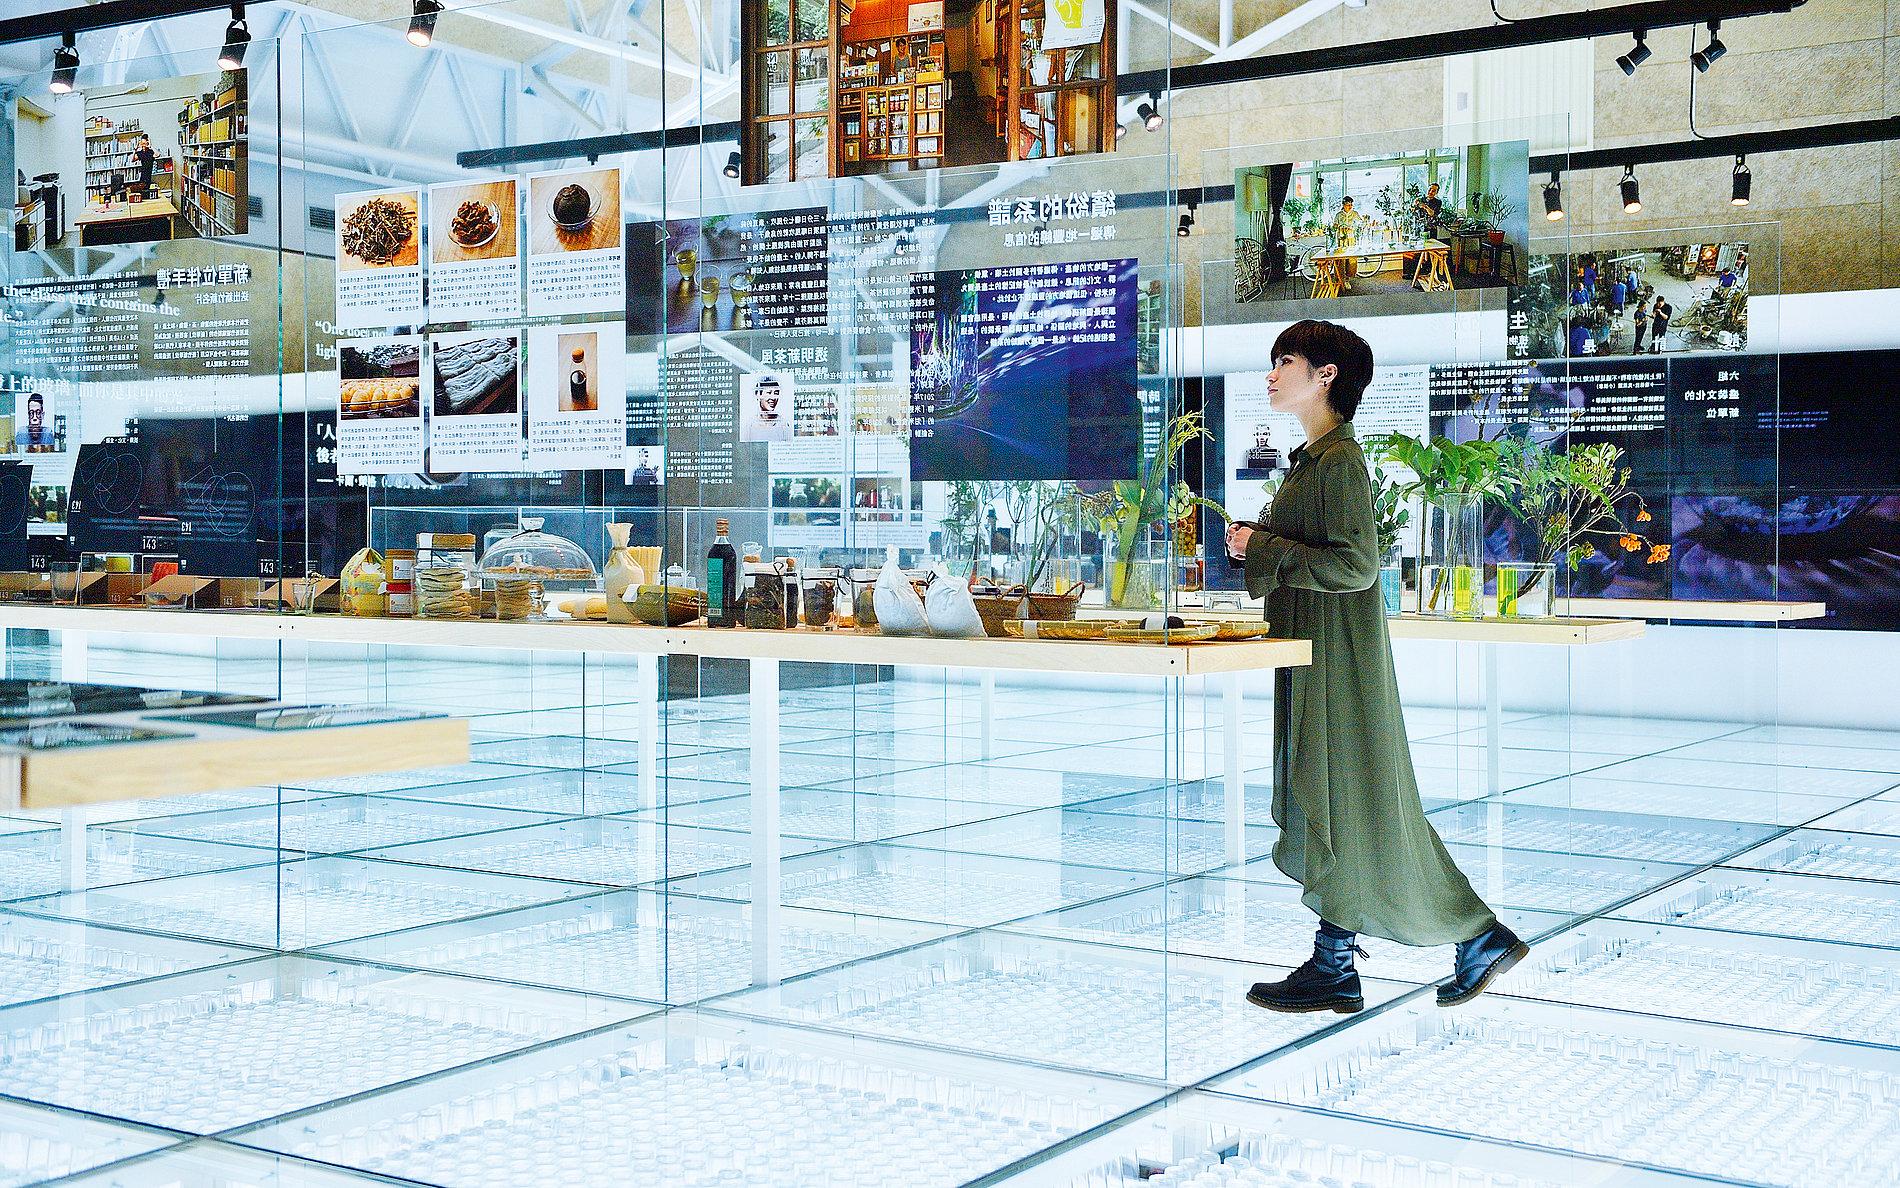 Hsinchu City Glass Art & Design Festival 2018 – Light Driving | Red Dot Design Award